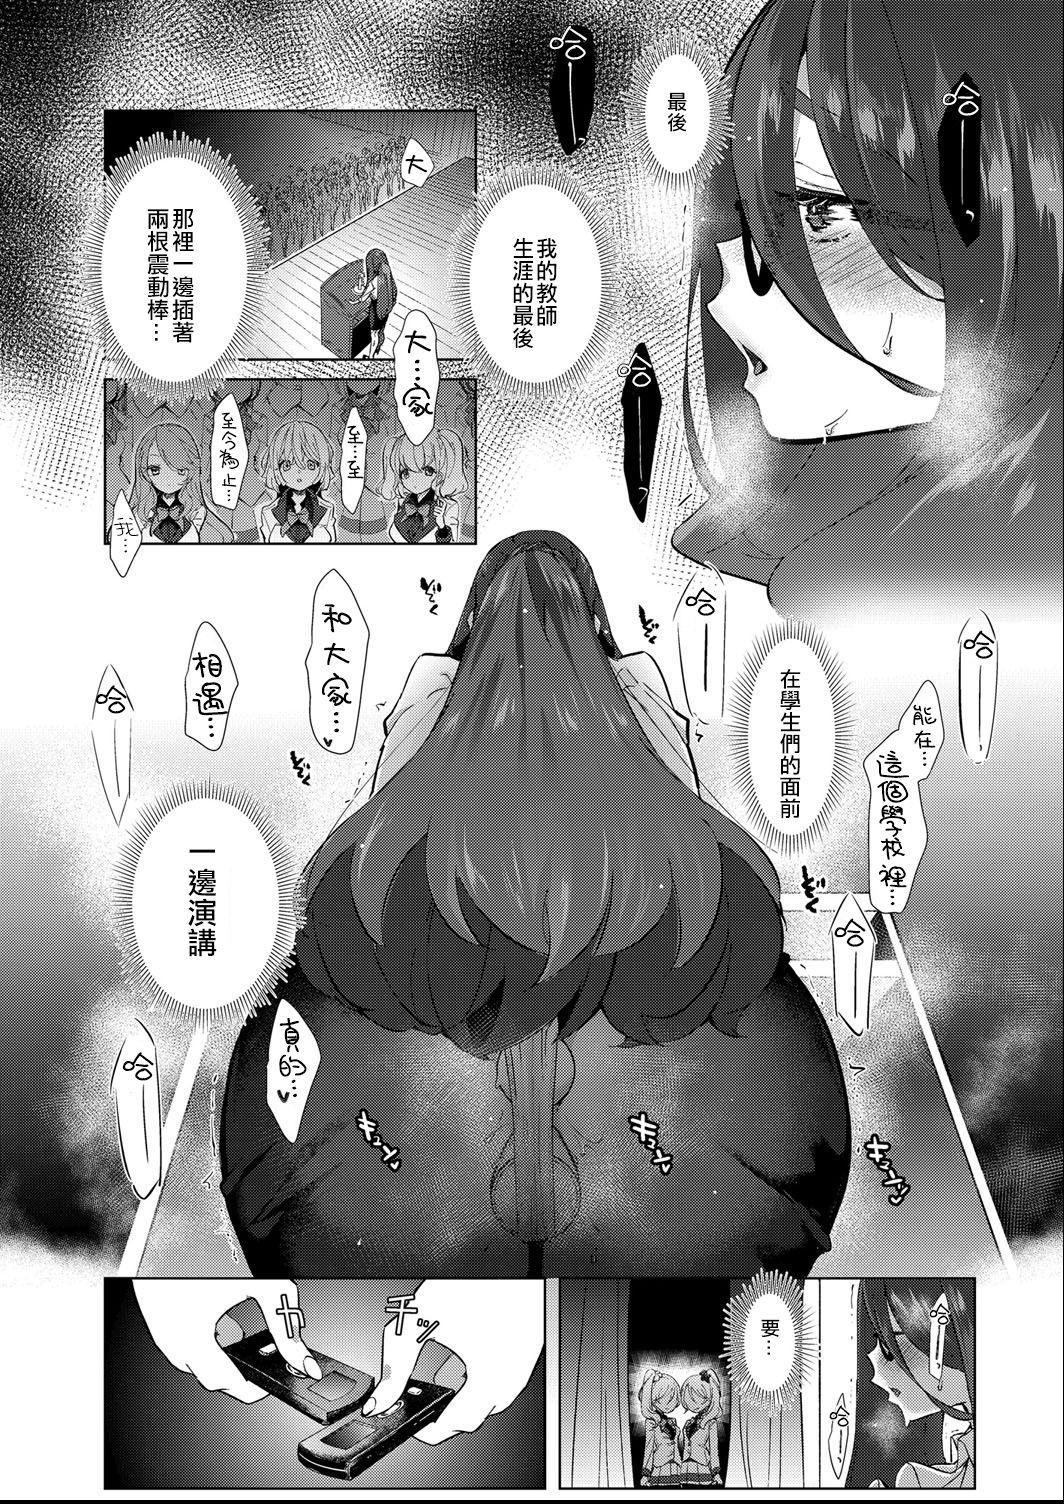 [Cyori Mokki] Geinou  Katsudou wa Yuri Ecchi no atode ch.1-3 丨藝能活動要在百合H後 第1-2話  [Chinese] [沒有漢化] [Digital] 37